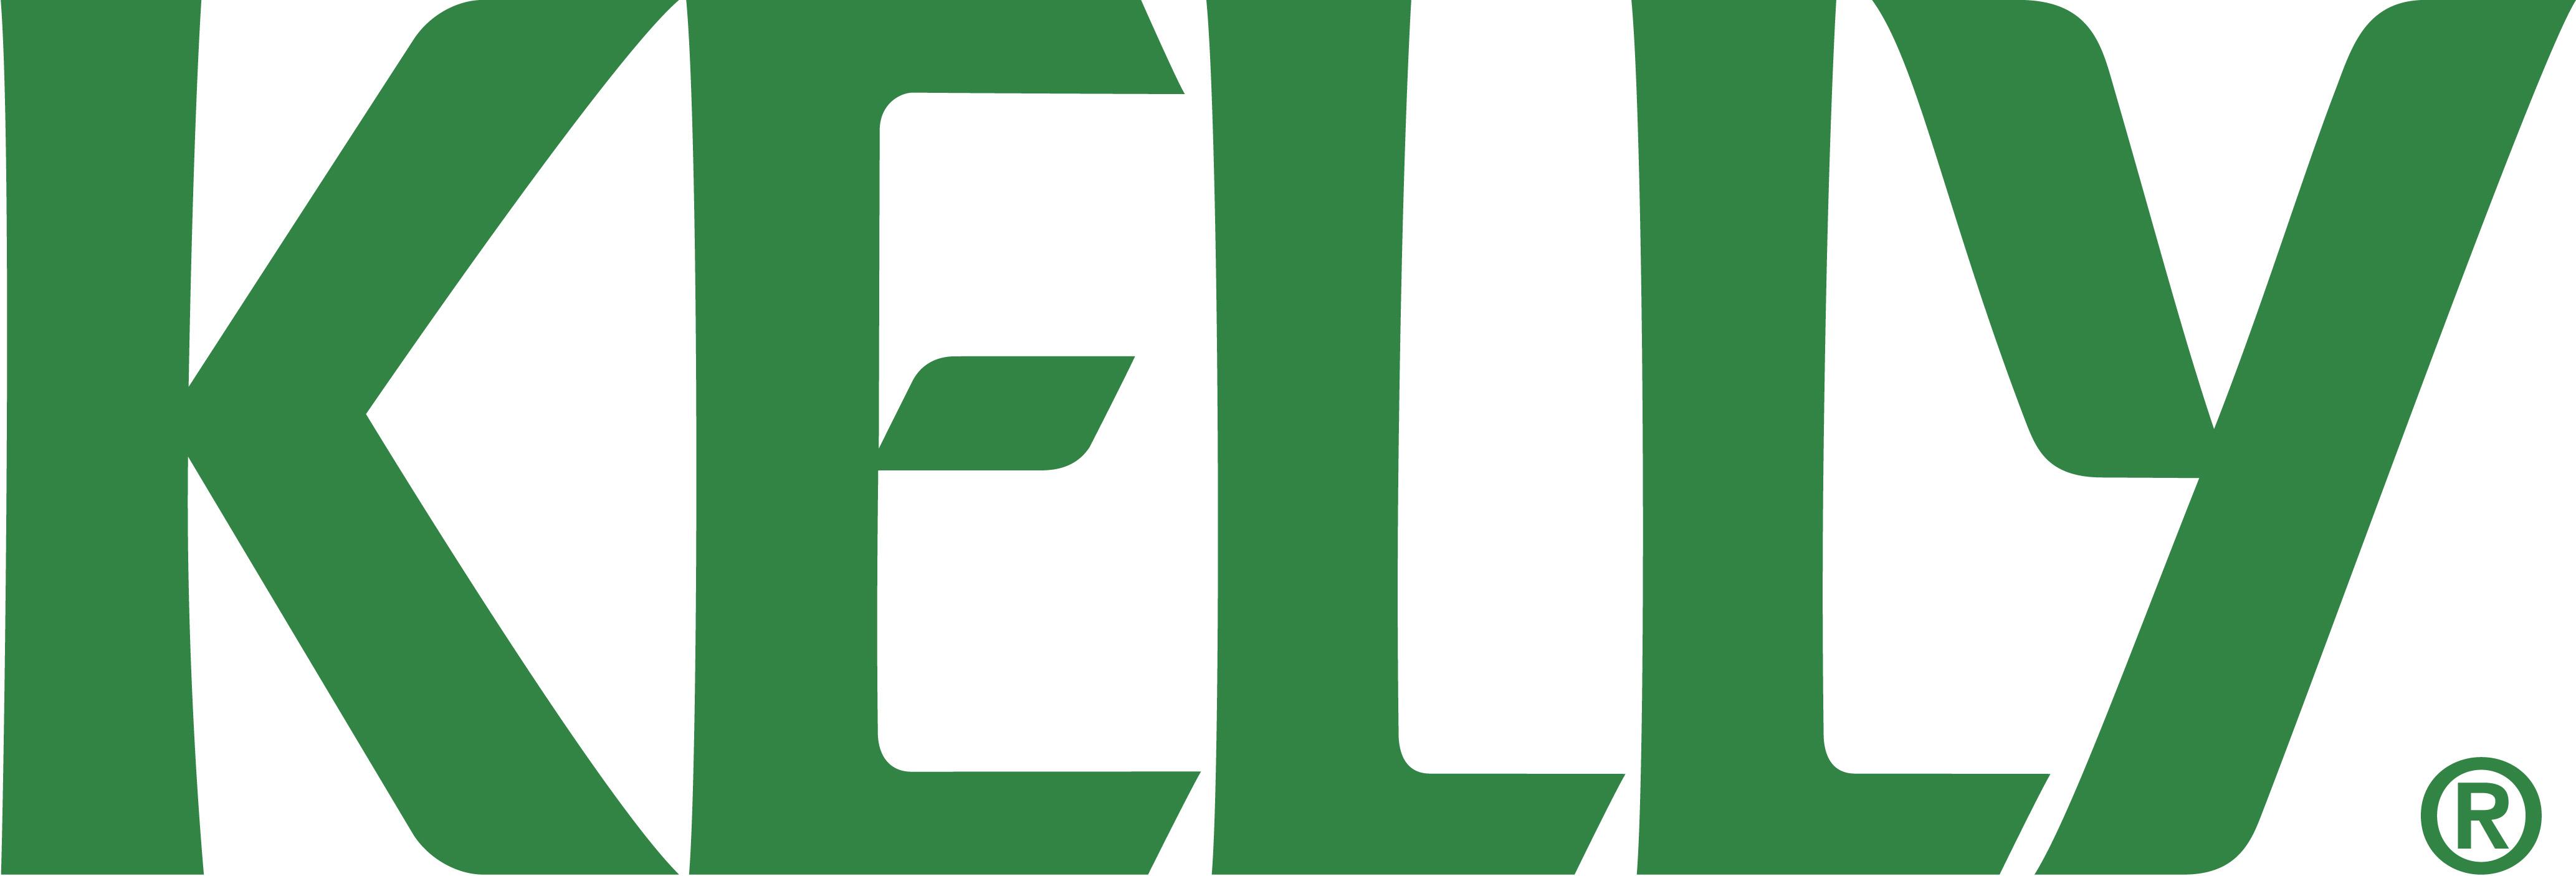 Kelly-Logo-TM